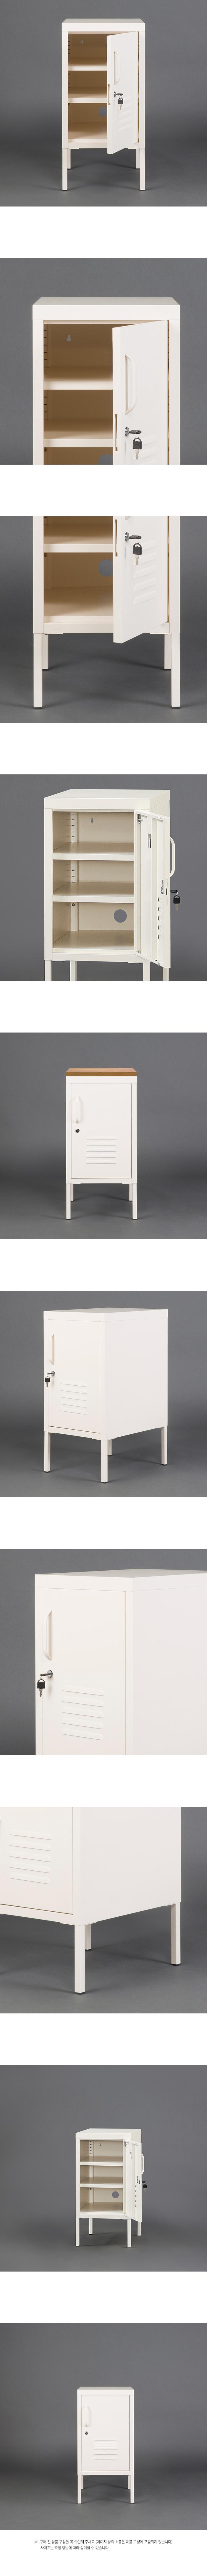 LLC-801_Metal-Cabinet_201120-3.jpg